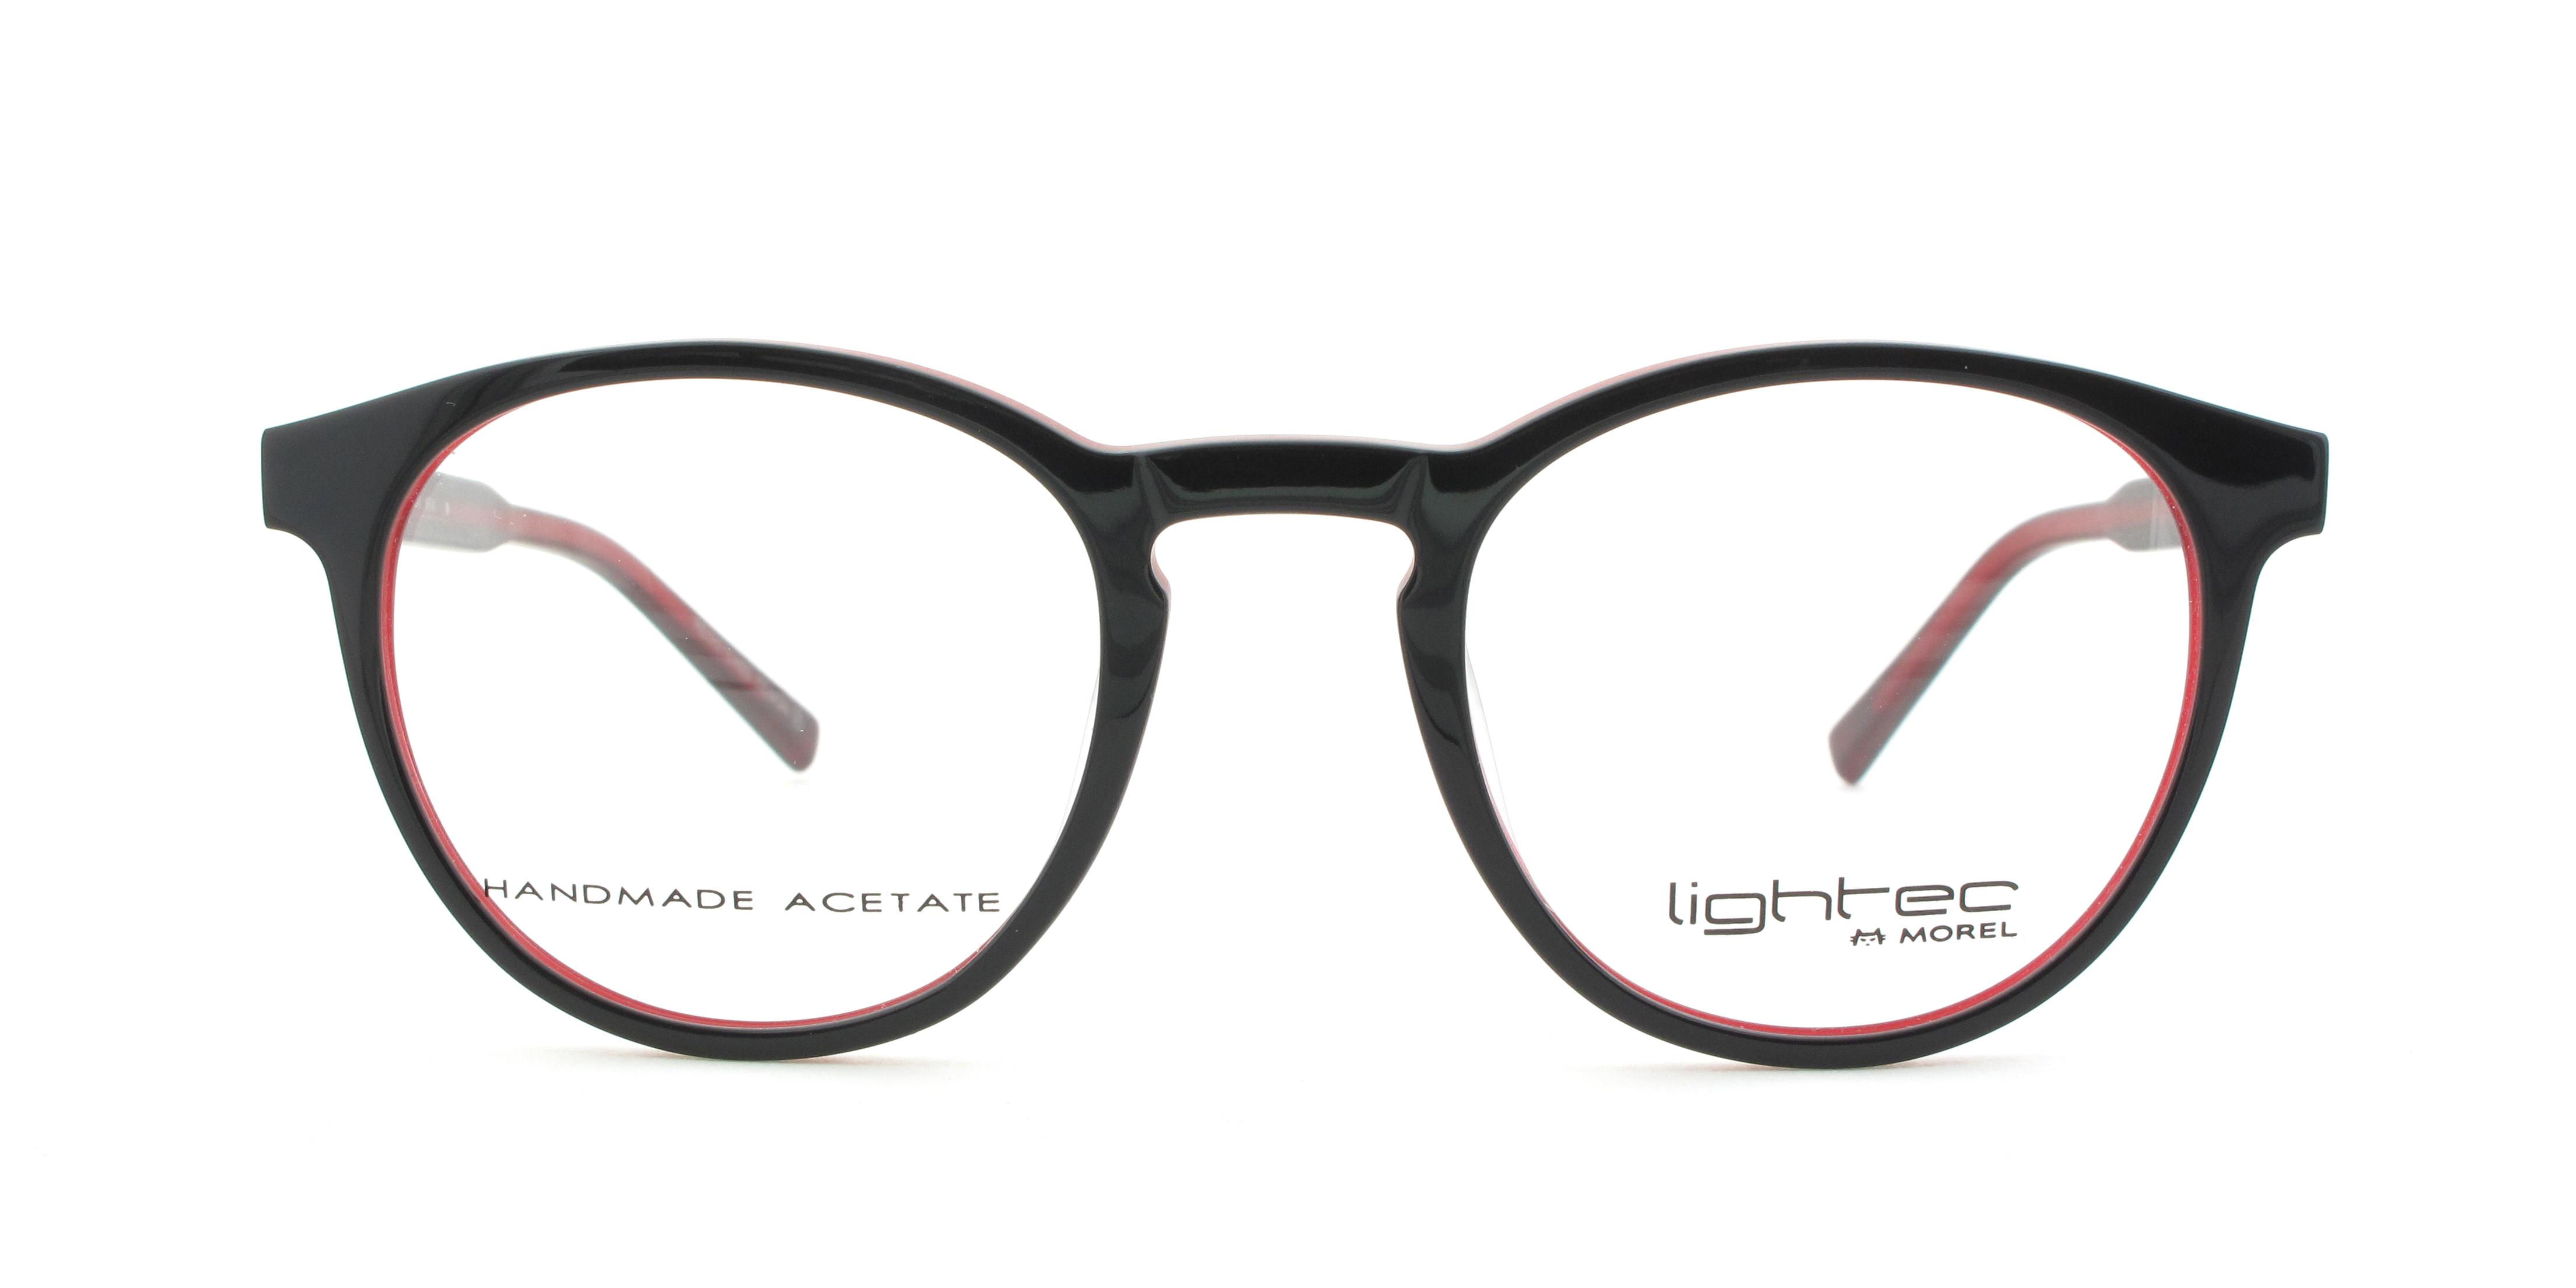 morel eyeglasses 30004 black men eyeglasses plastic pantos - Morel Frames